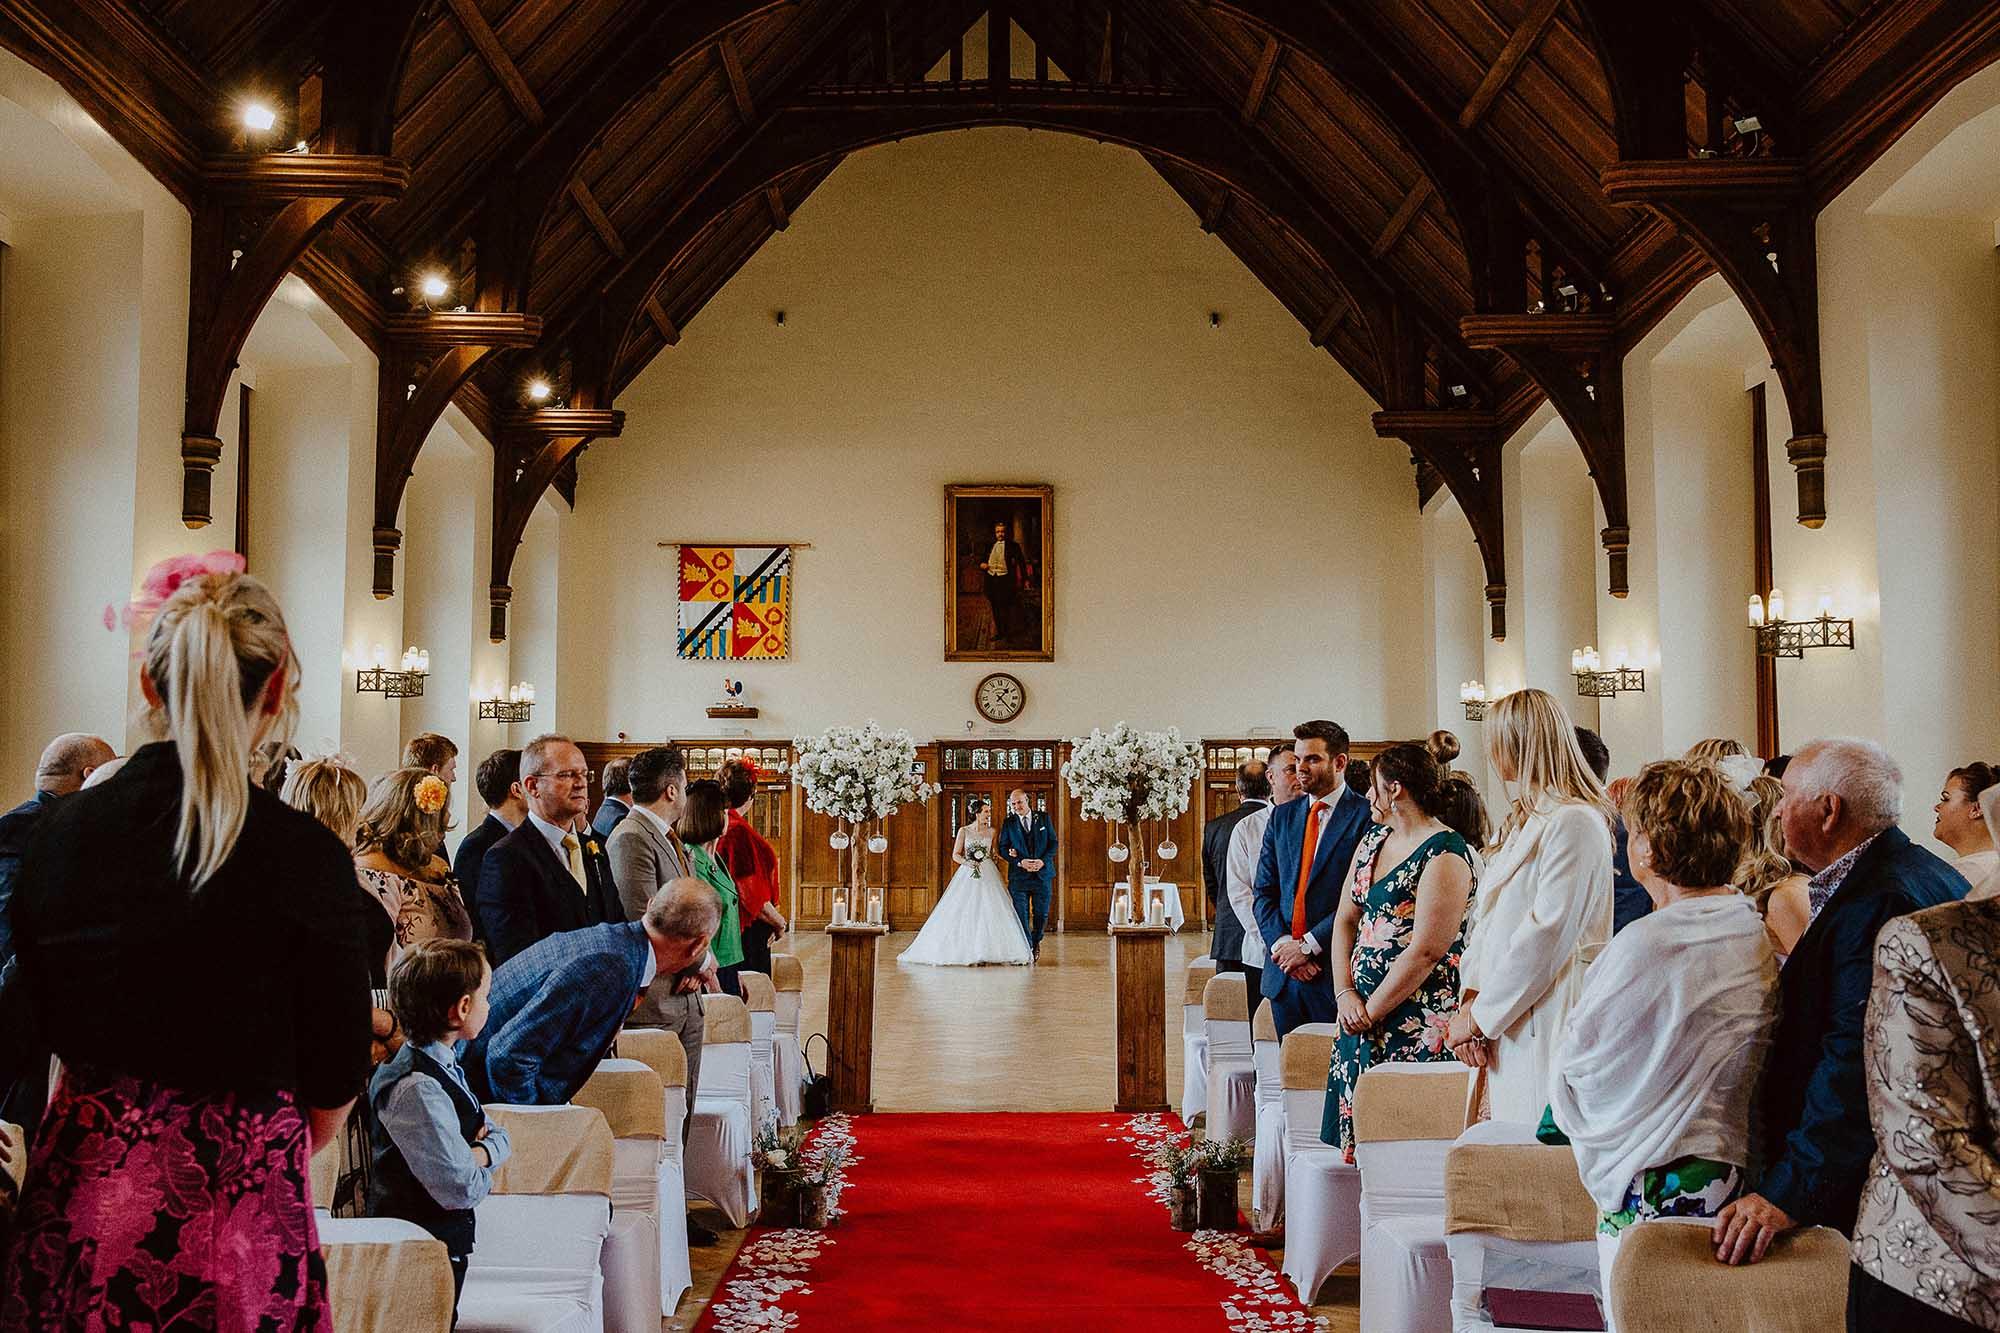 Bolton School wedding ceremony room